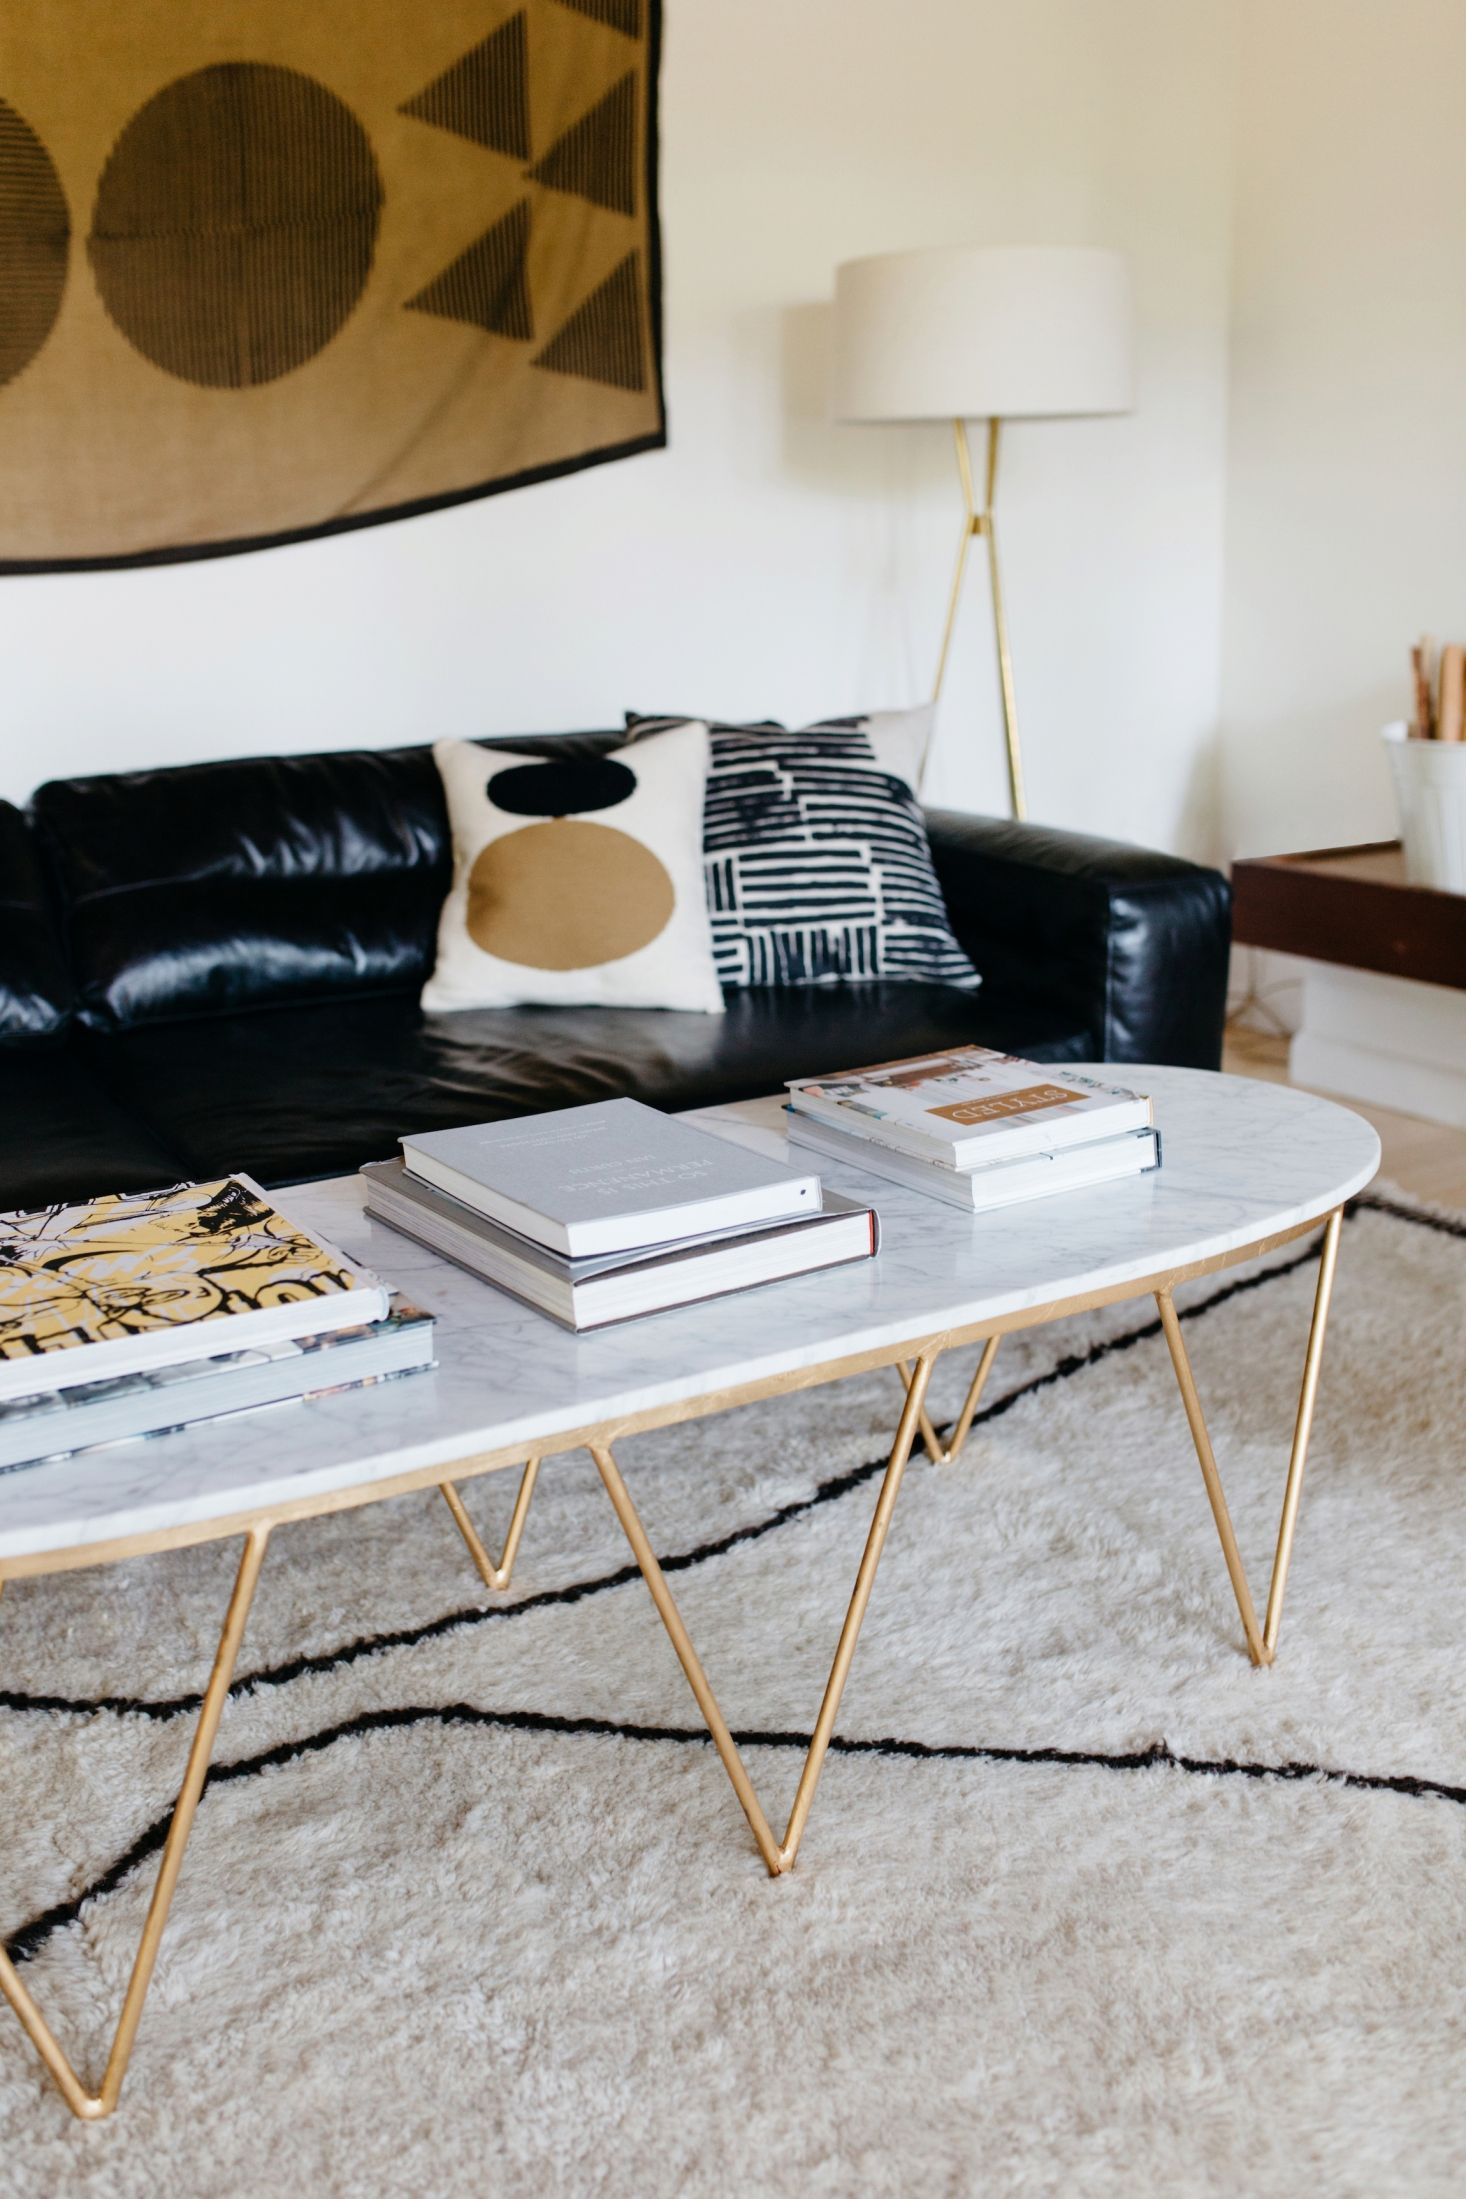 Portlandia reimagining a midcentury ranch furniture to love